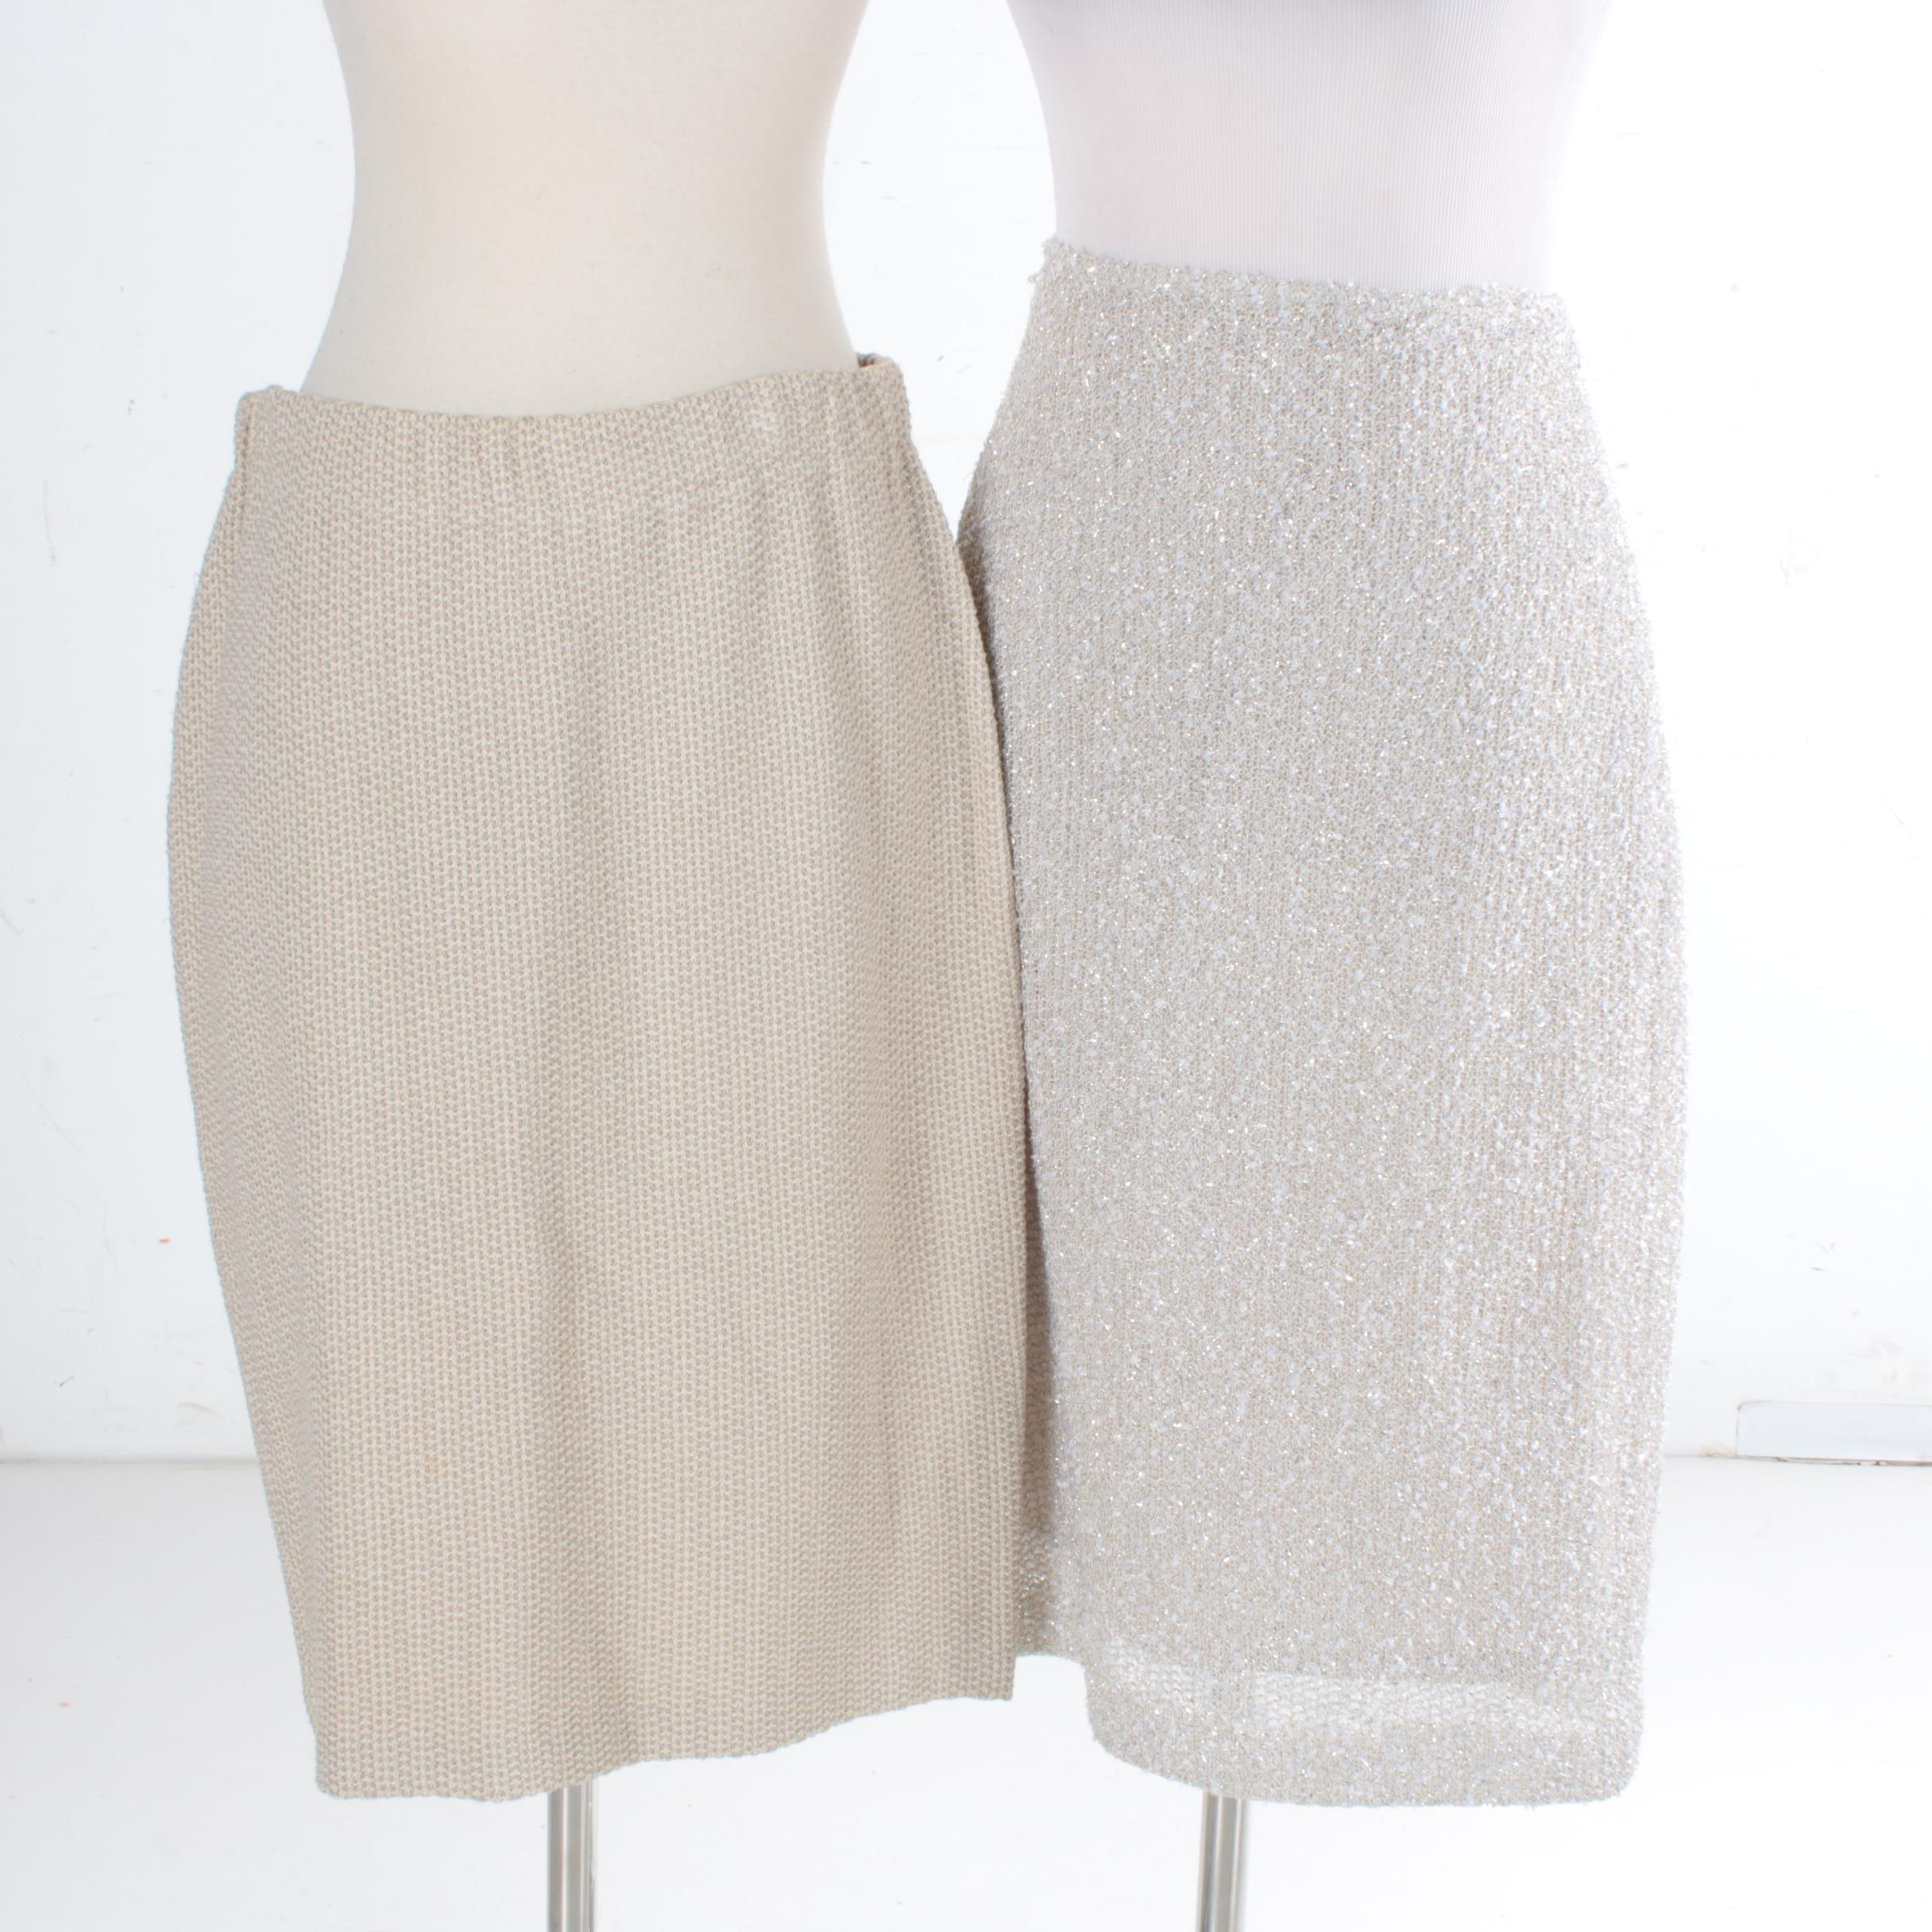 St. John Knit Skirts